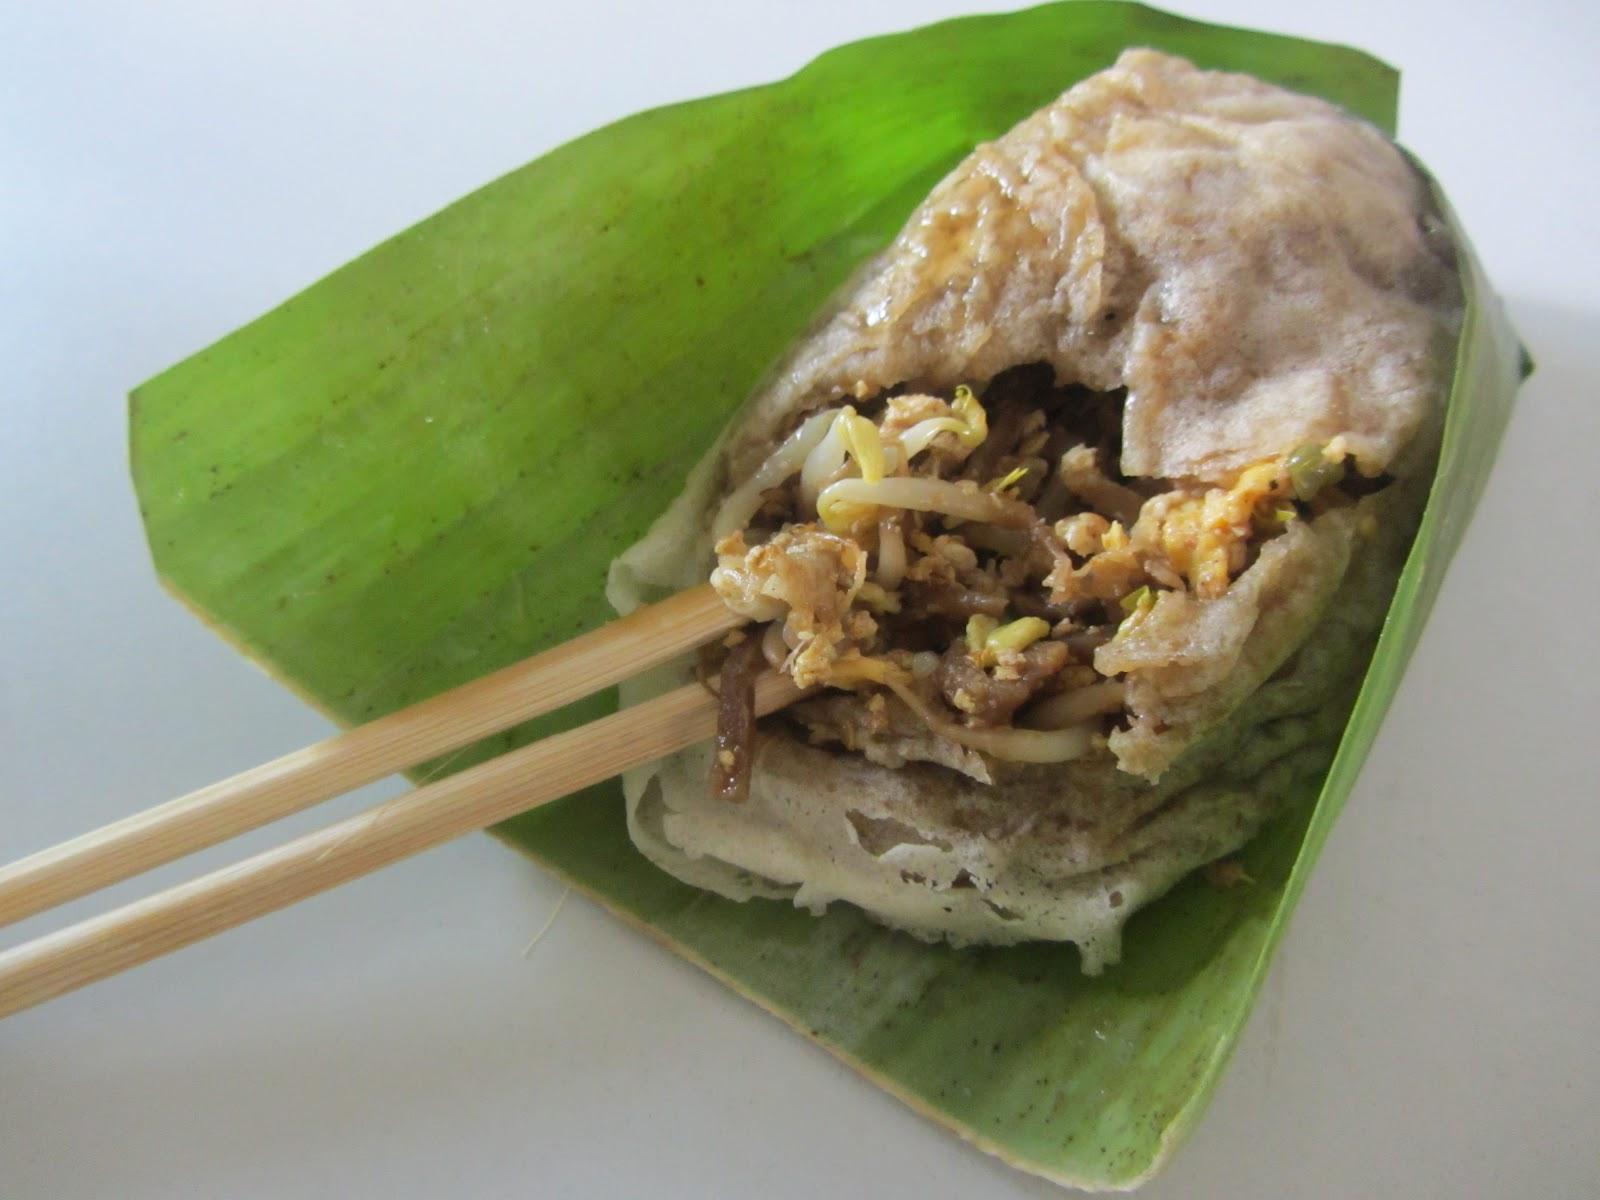 Lumpia Basah Khas Bandung Toko Online Oleh Kuliner Sambel Bawang Kering By Khohar Cianjur Bdg